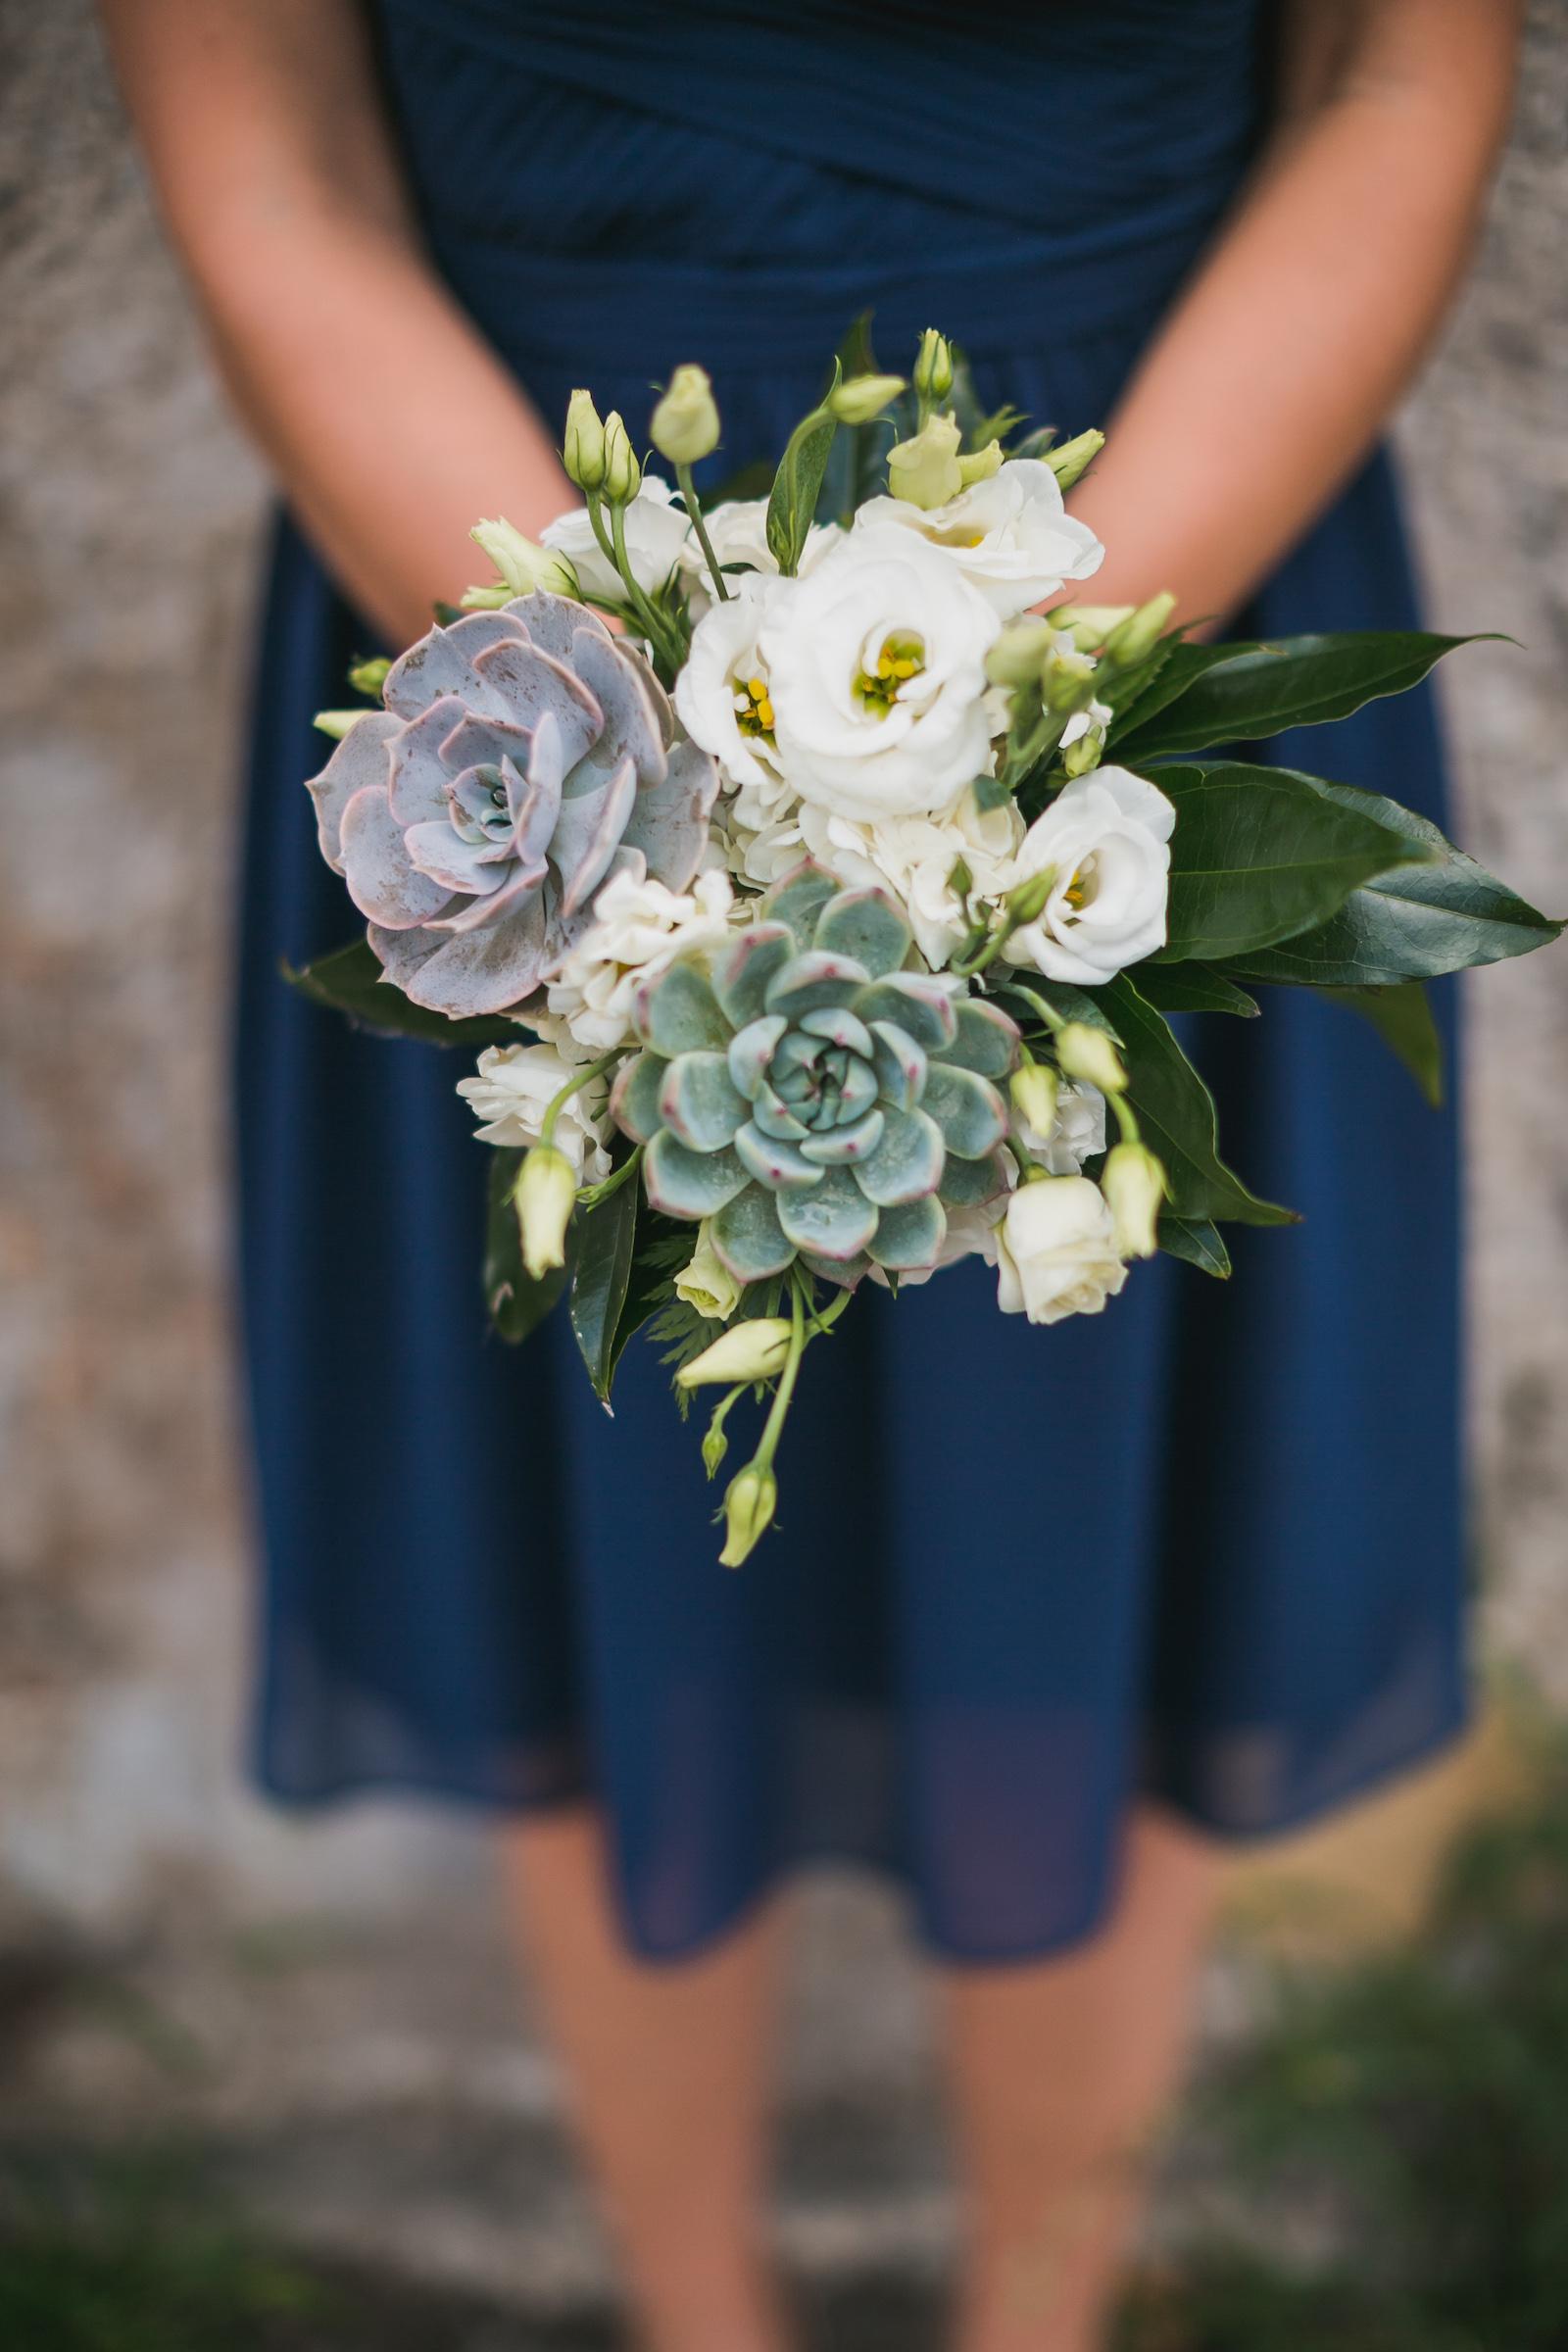 wisconsin-wedding-acowsay-uttke-photography-36.jpg